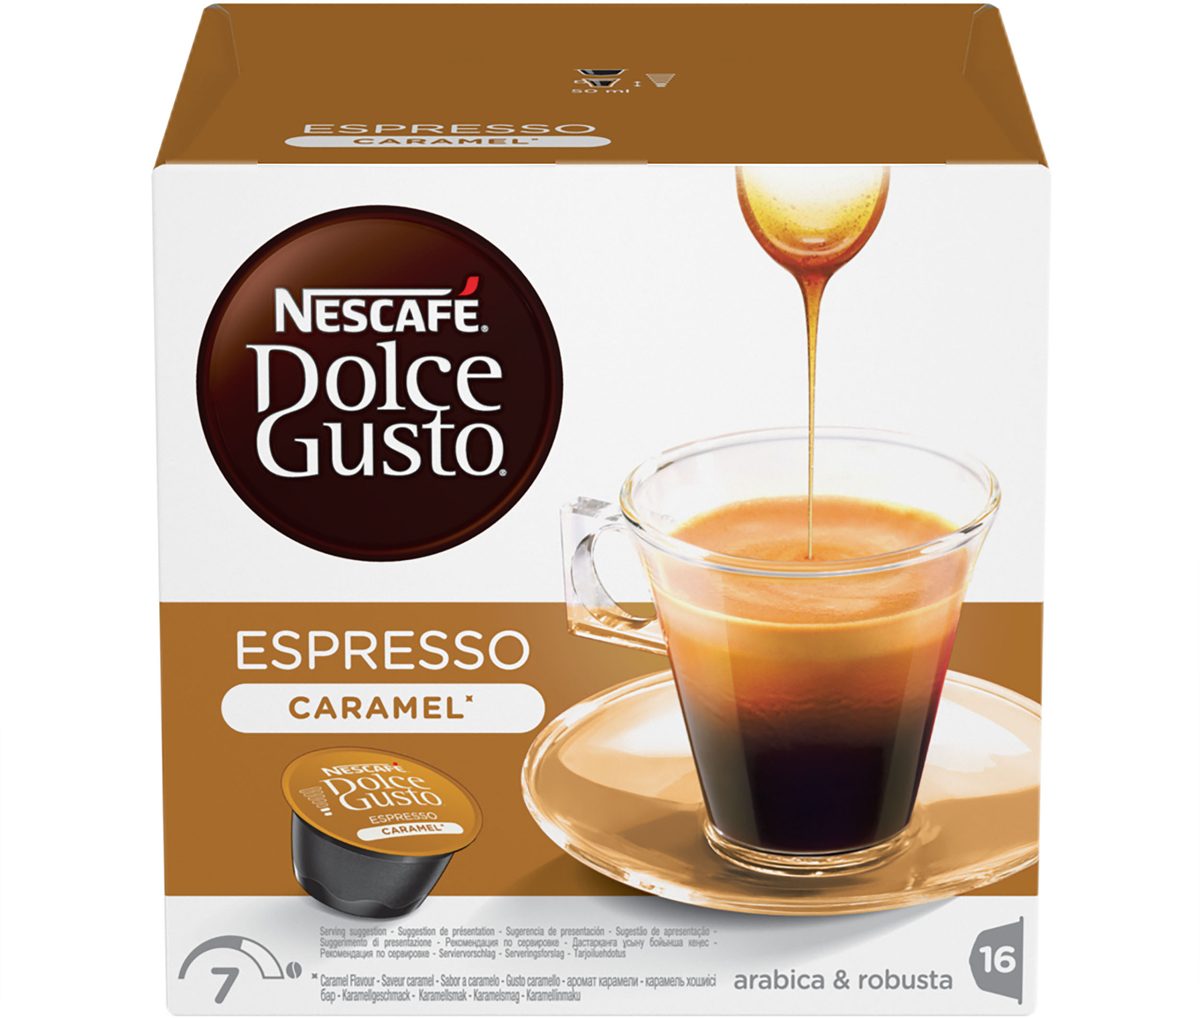 Nescafe Dolce Gusto Espresso Caramel кофе в капсулах, 16 шт nescafe dolce gusto cortado эспрессо с молоком кофе в капсулах 16 шт